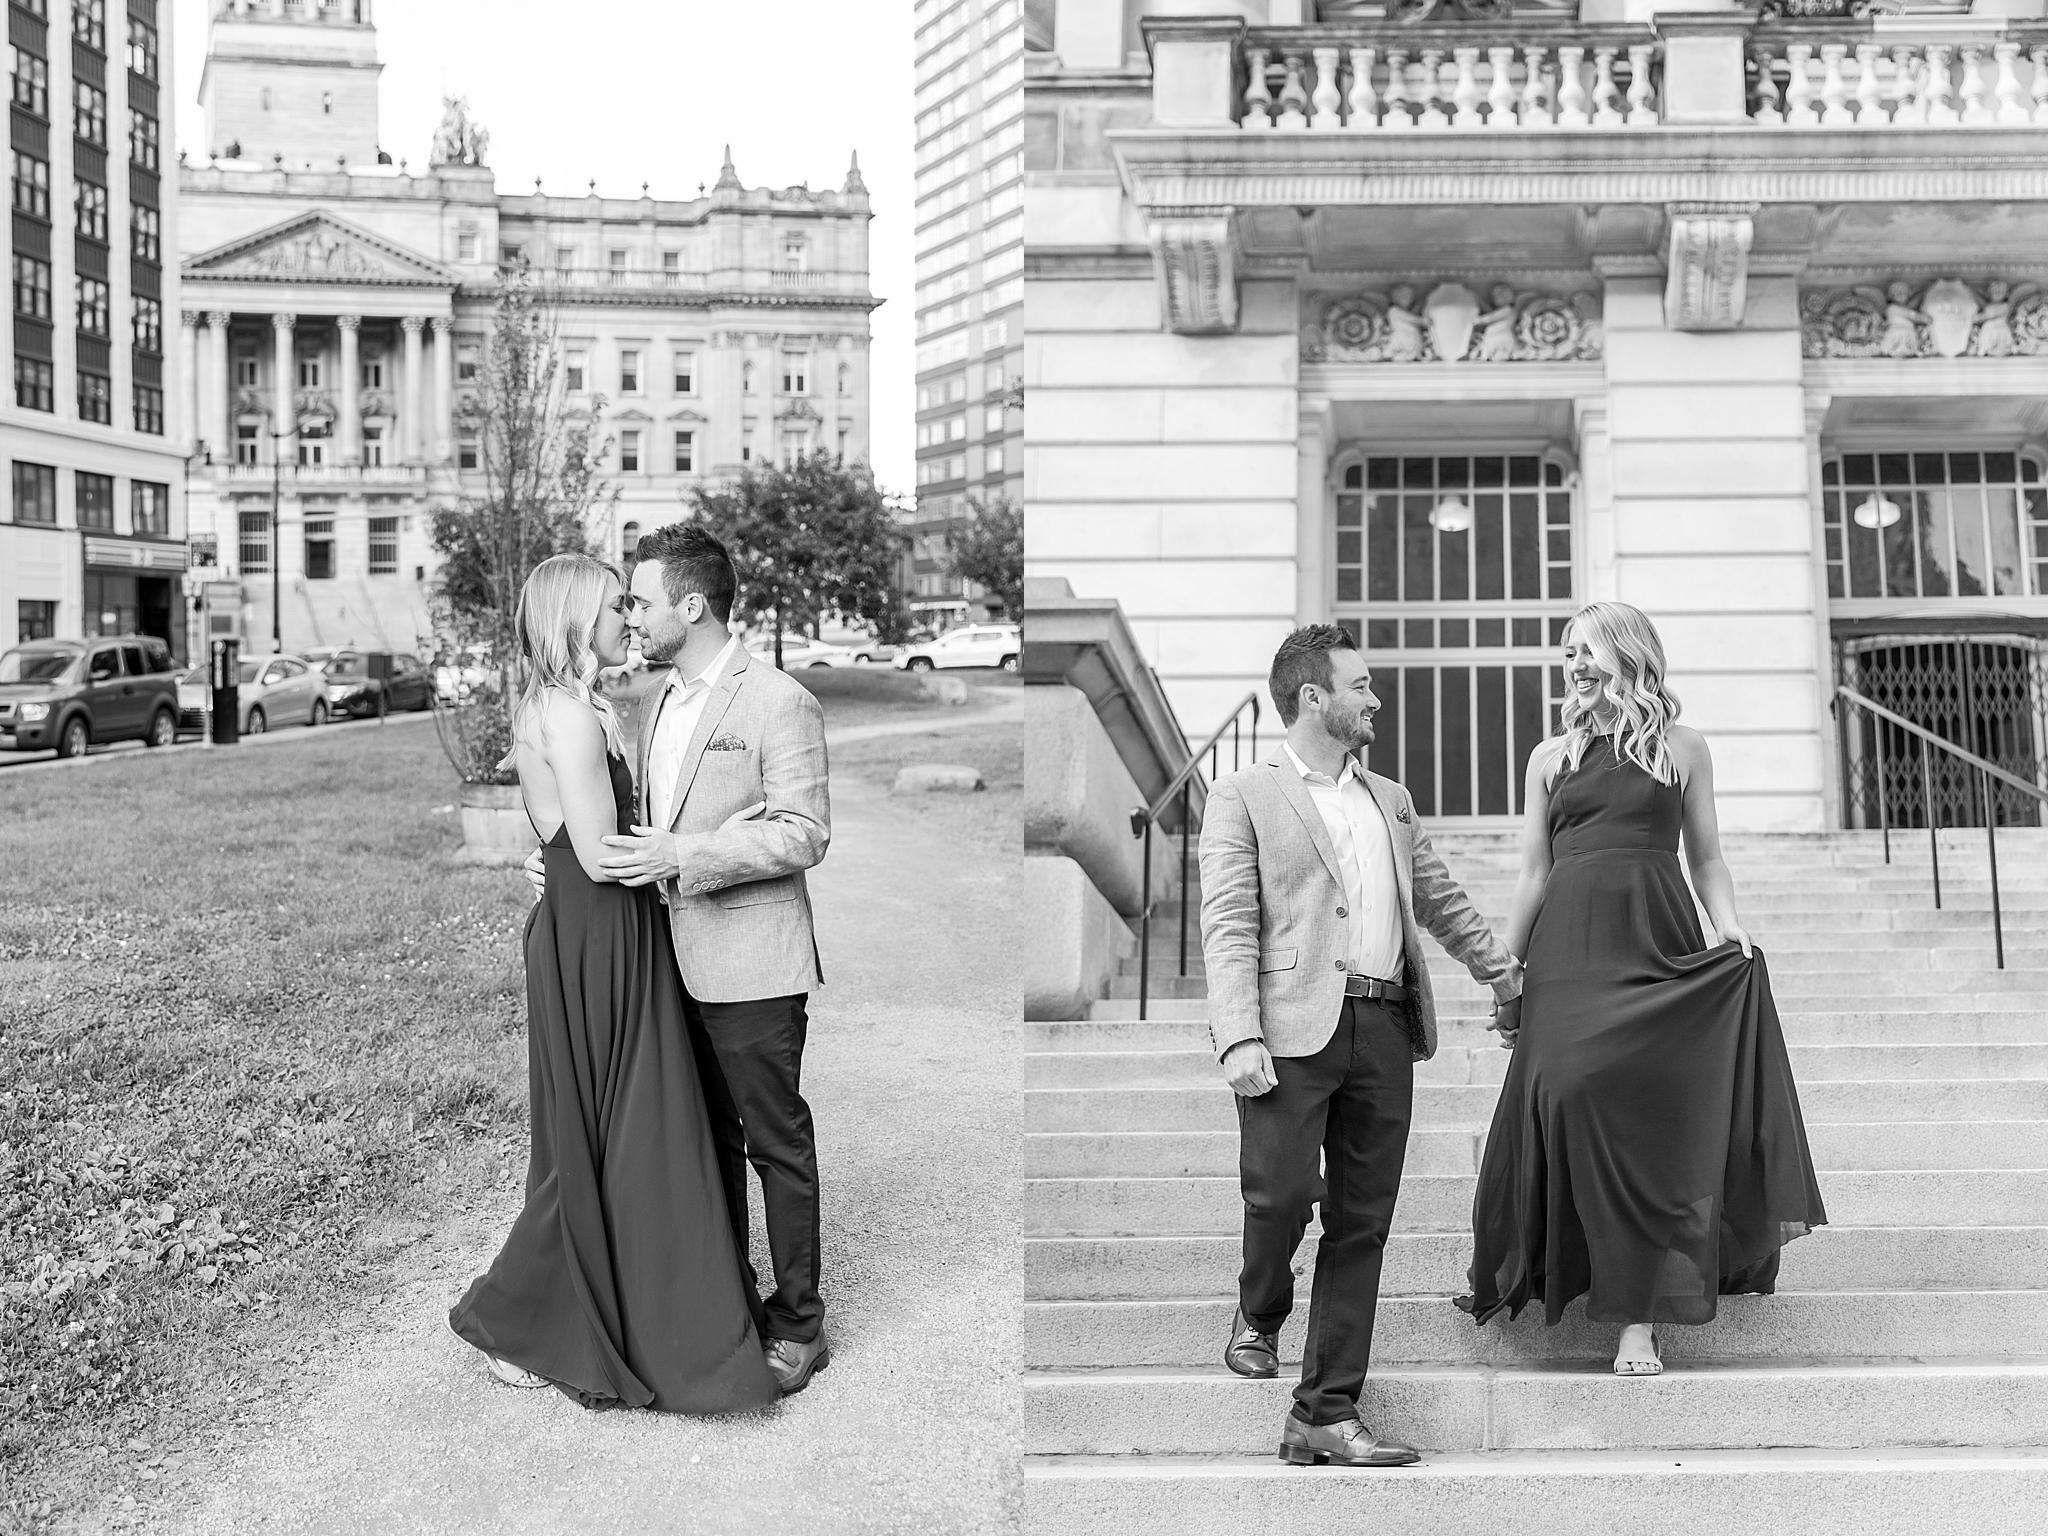 detroit-wedding-photographer-downtown-detroit-belle-isle-engagement-photos-sarah-eric-by-courtney-carolyn-photography_0031.jpg